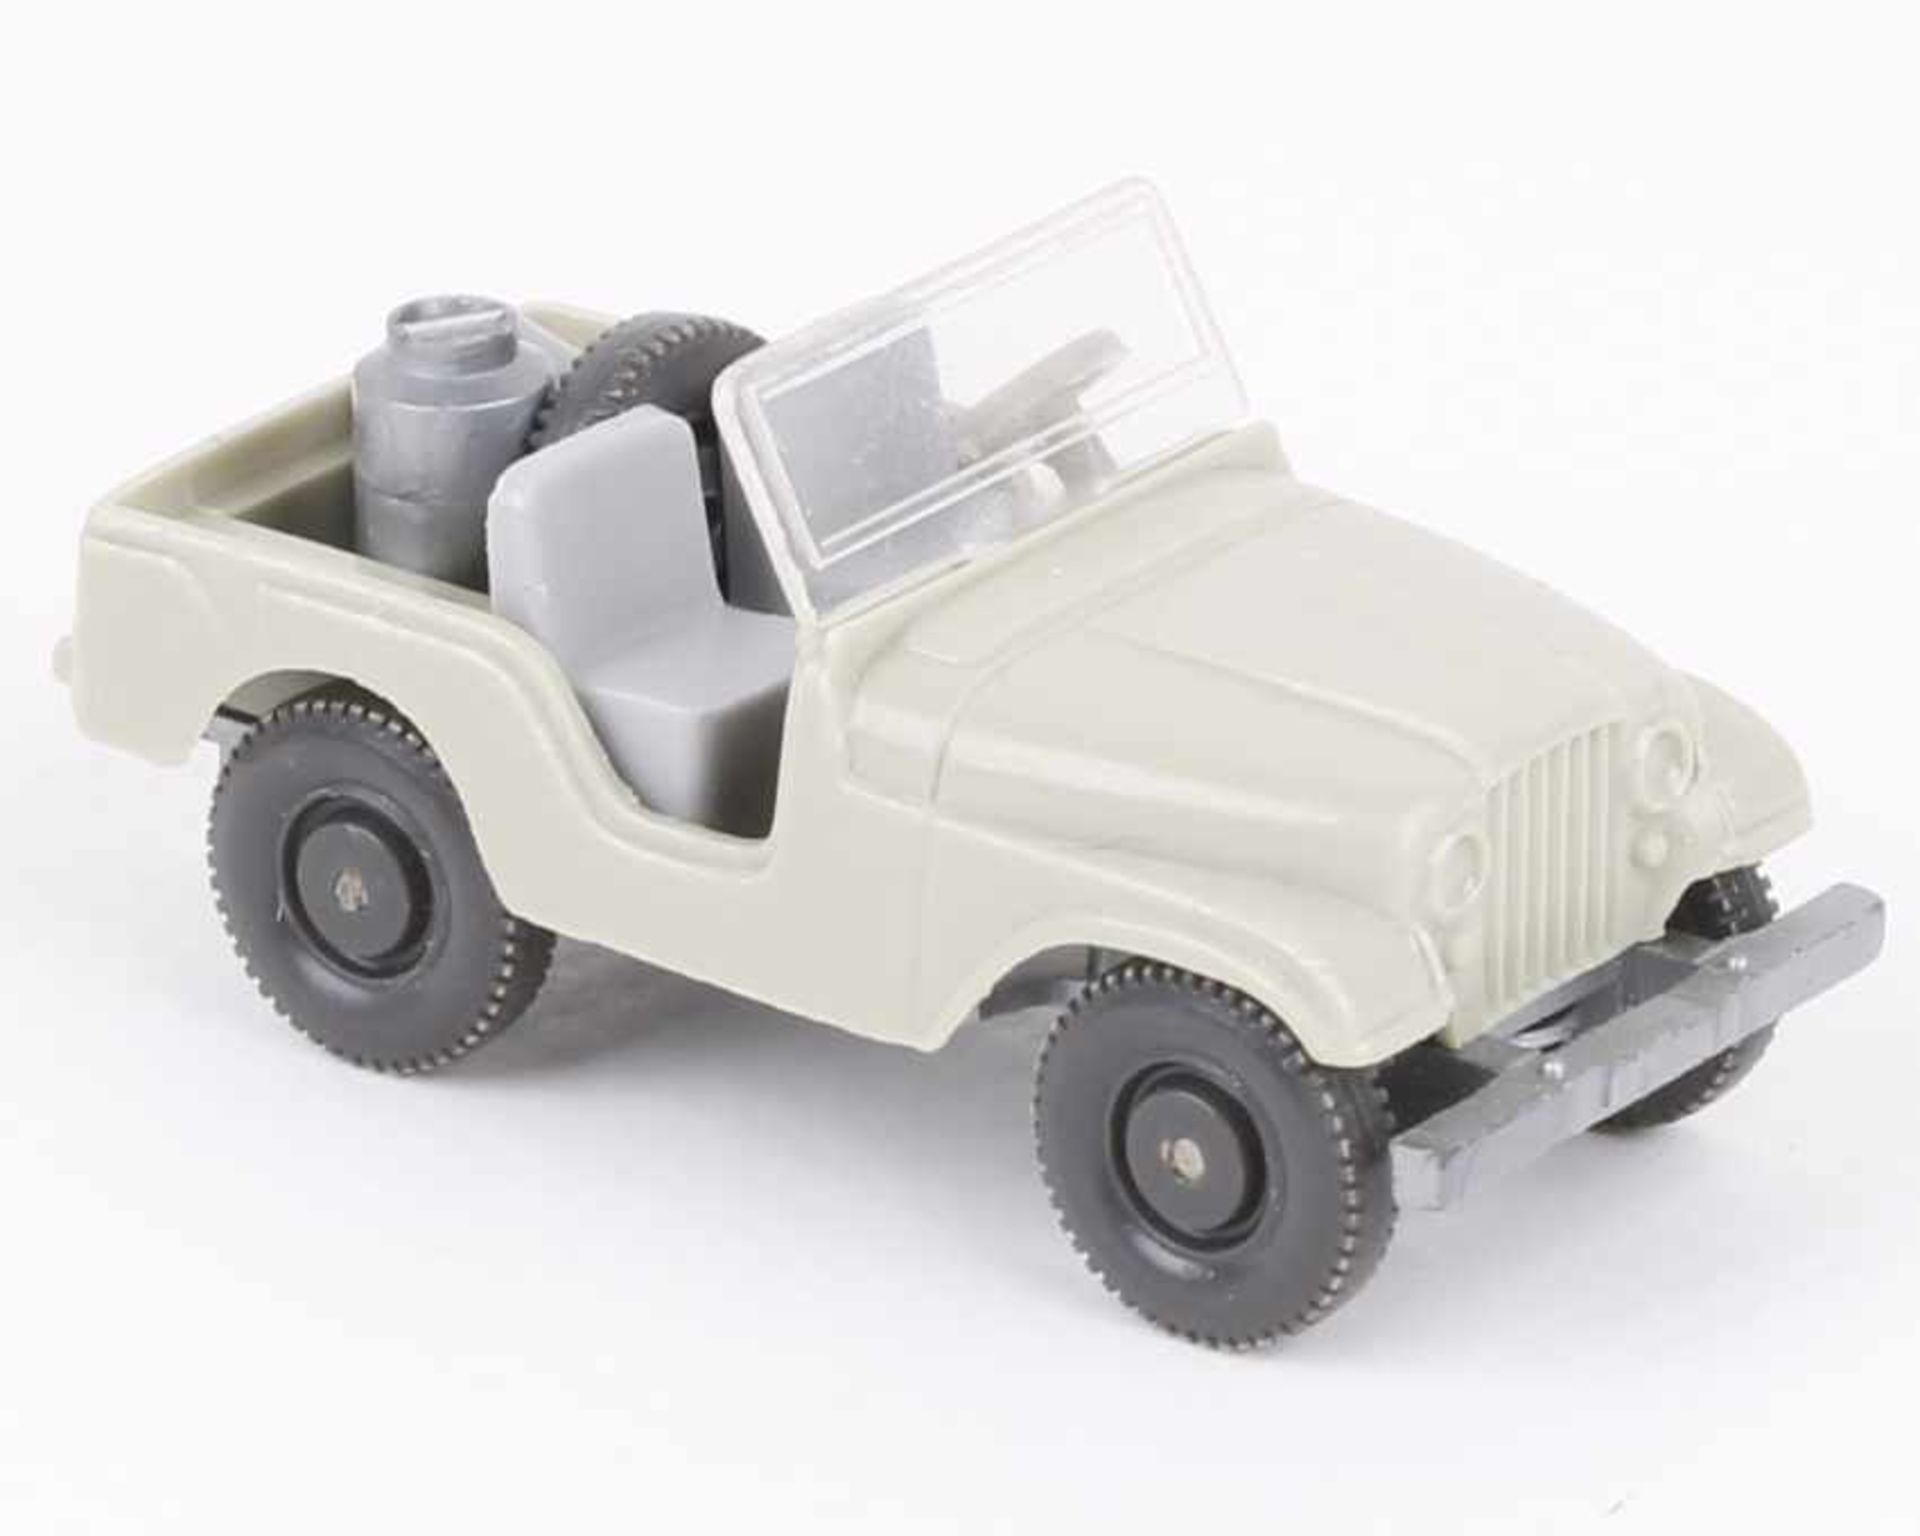 Los 1047 - WikingFarmer Jeep h'grünbeige12/2b, neuwertig